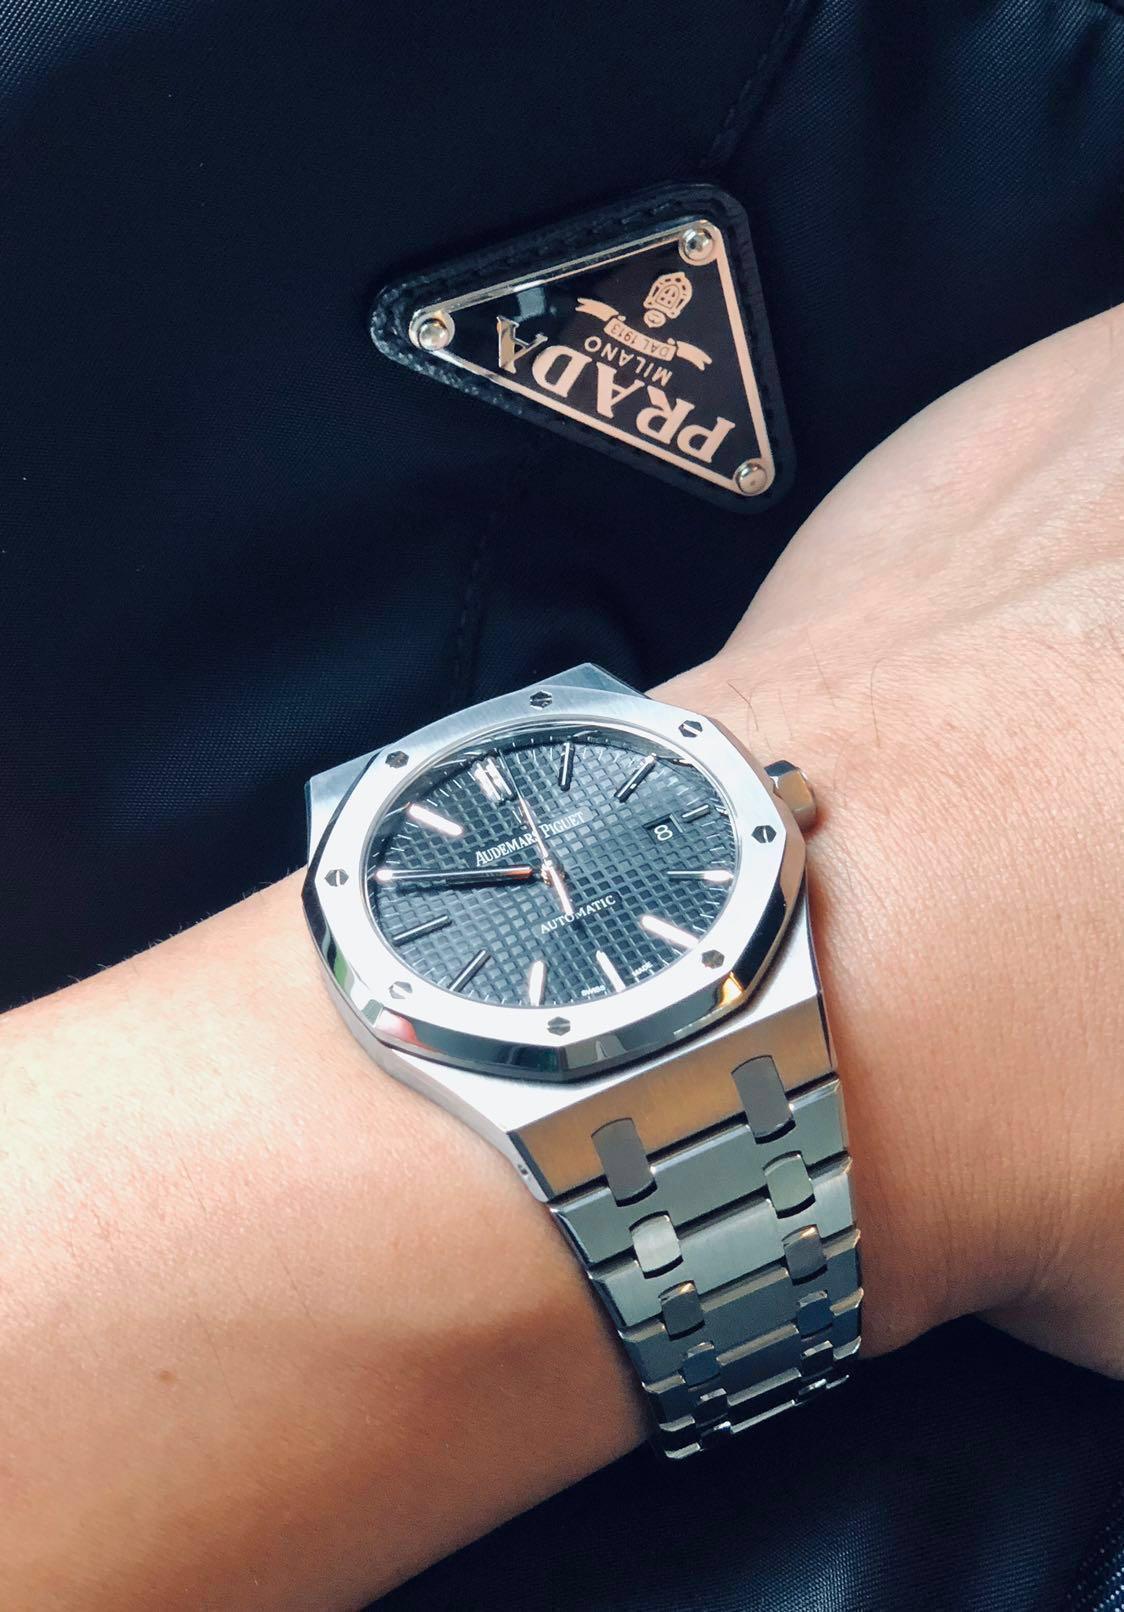 697ed0a32f8 Audemars Piguet Royal Oak 15400st Black dial., Luxury, Watches on Carousell